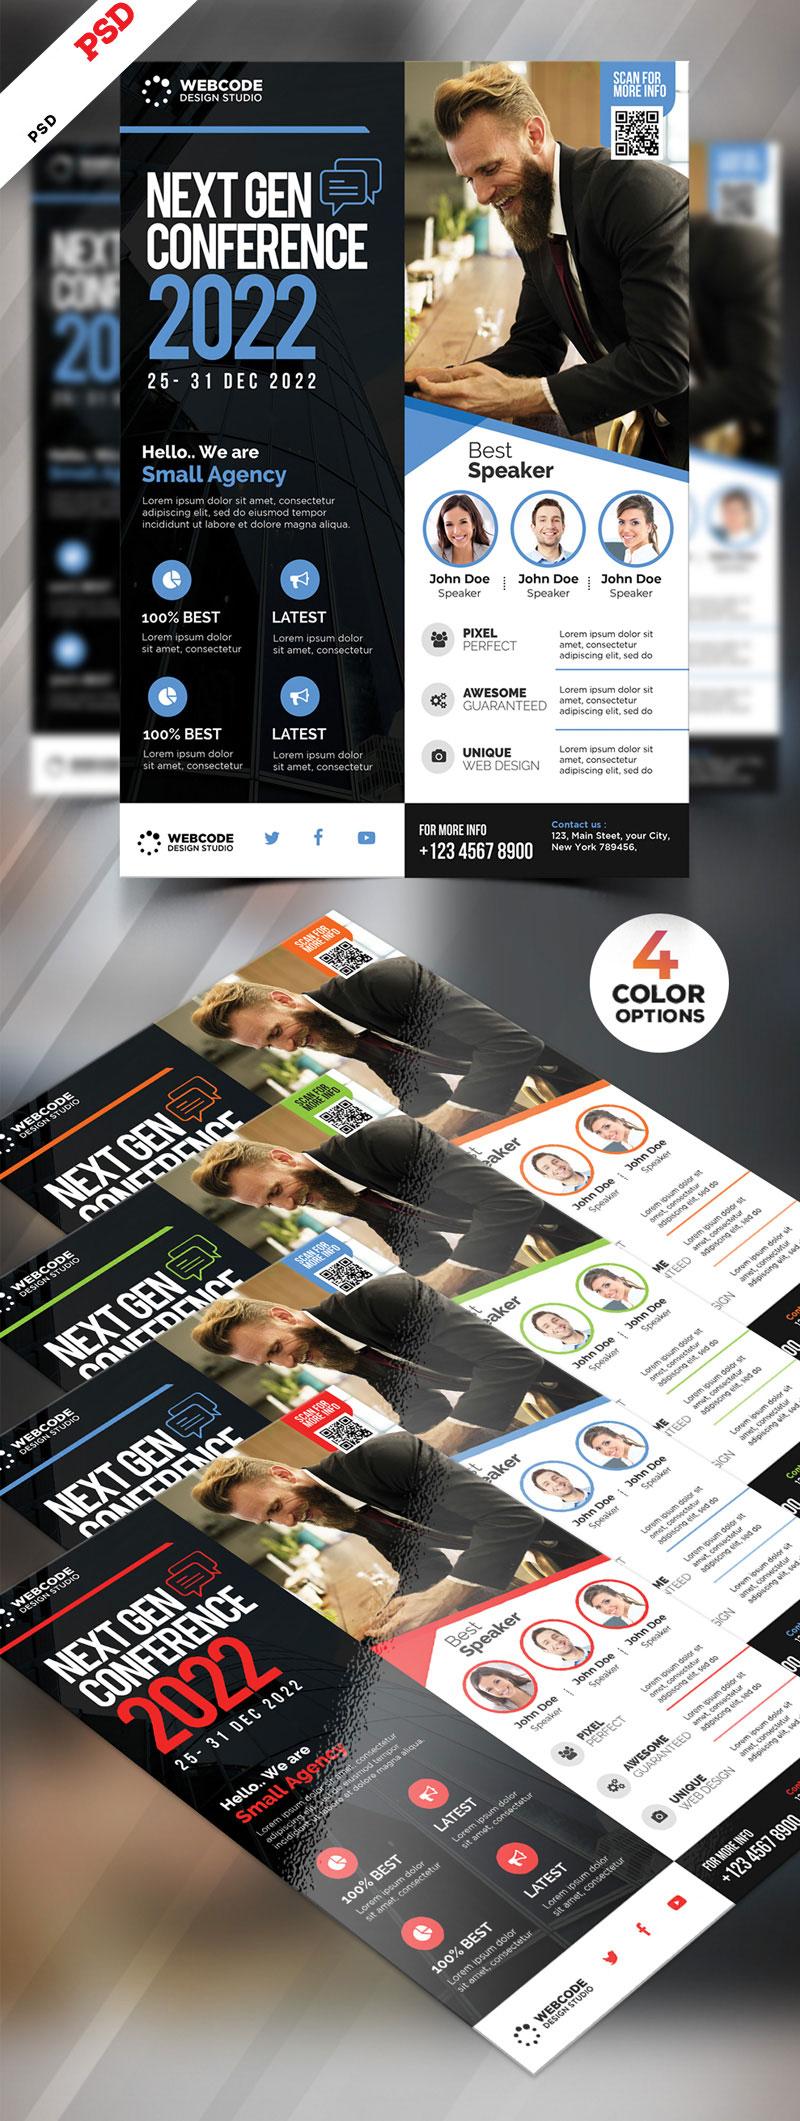 p673 - پوستر معرفی لایه باز خدمات شرکت تجاری فناوری با چهار رنگ جذاب انتخاباتی